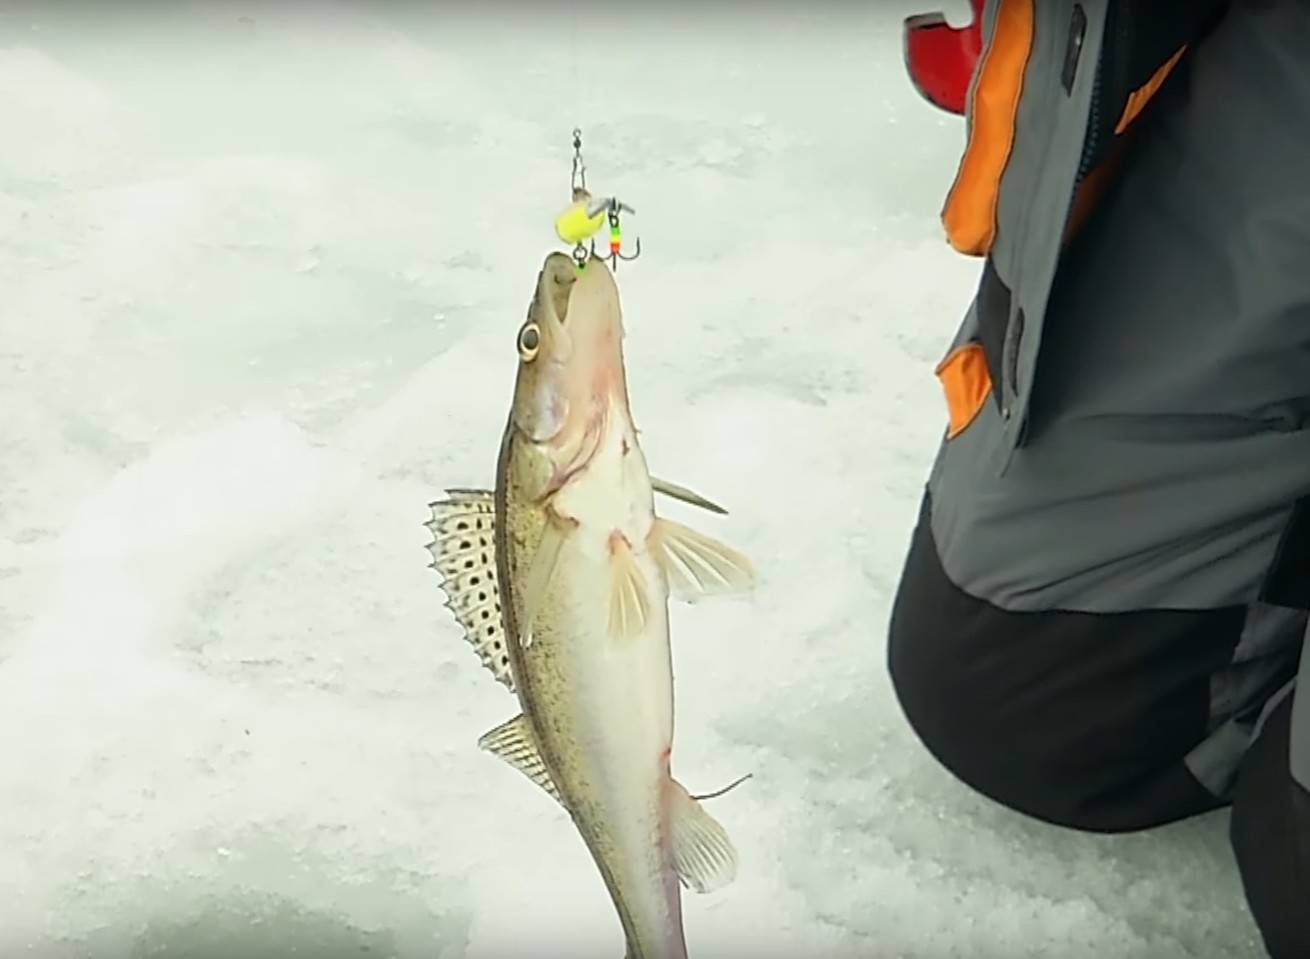 Ловля судака на балансир зимой - на рыбалке!